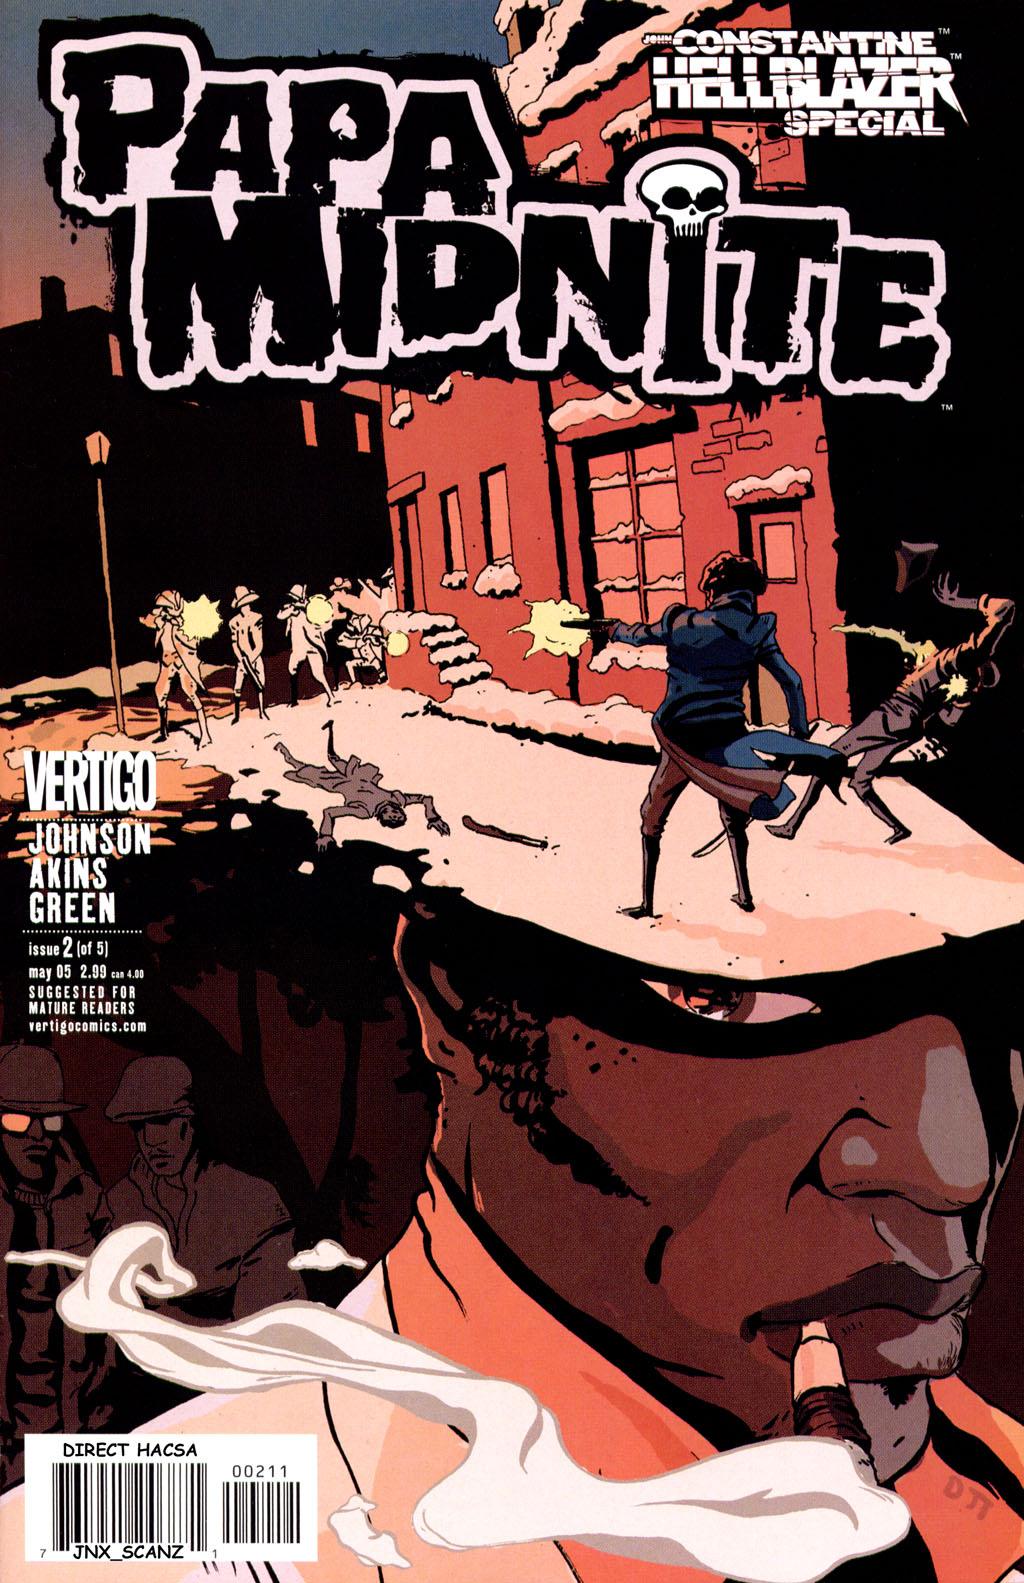 John Constantine - Hellblazer Special: Papa Midnite issue 2 - Page 1